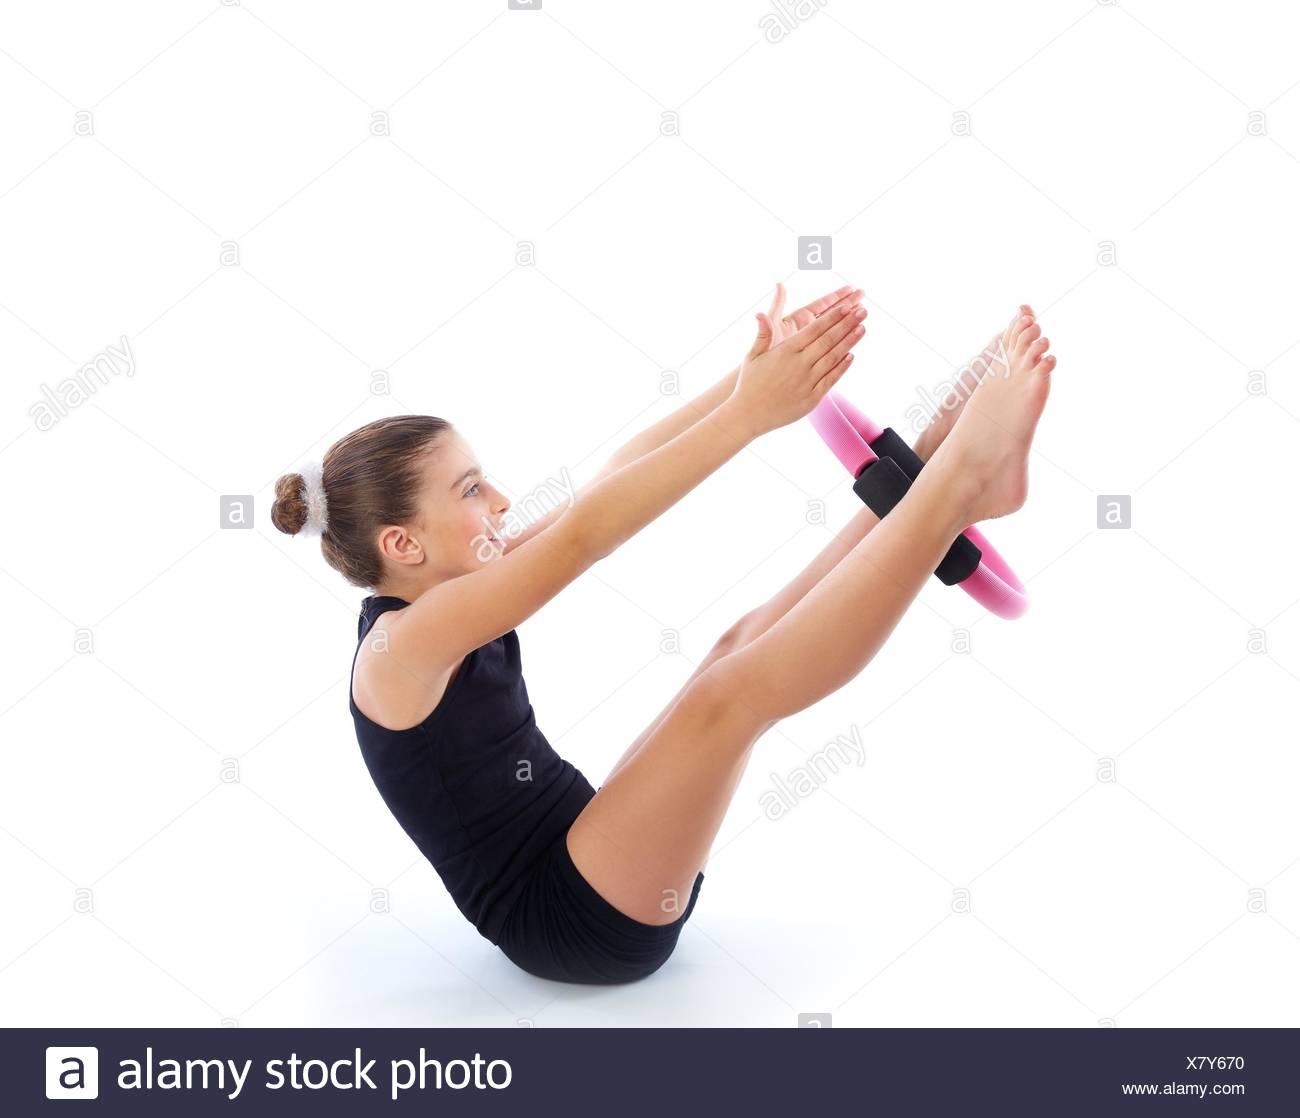 Fitness Pilates Yoga Ring Kid Girl Exercise Workout On White Background Stock Photo Alamy